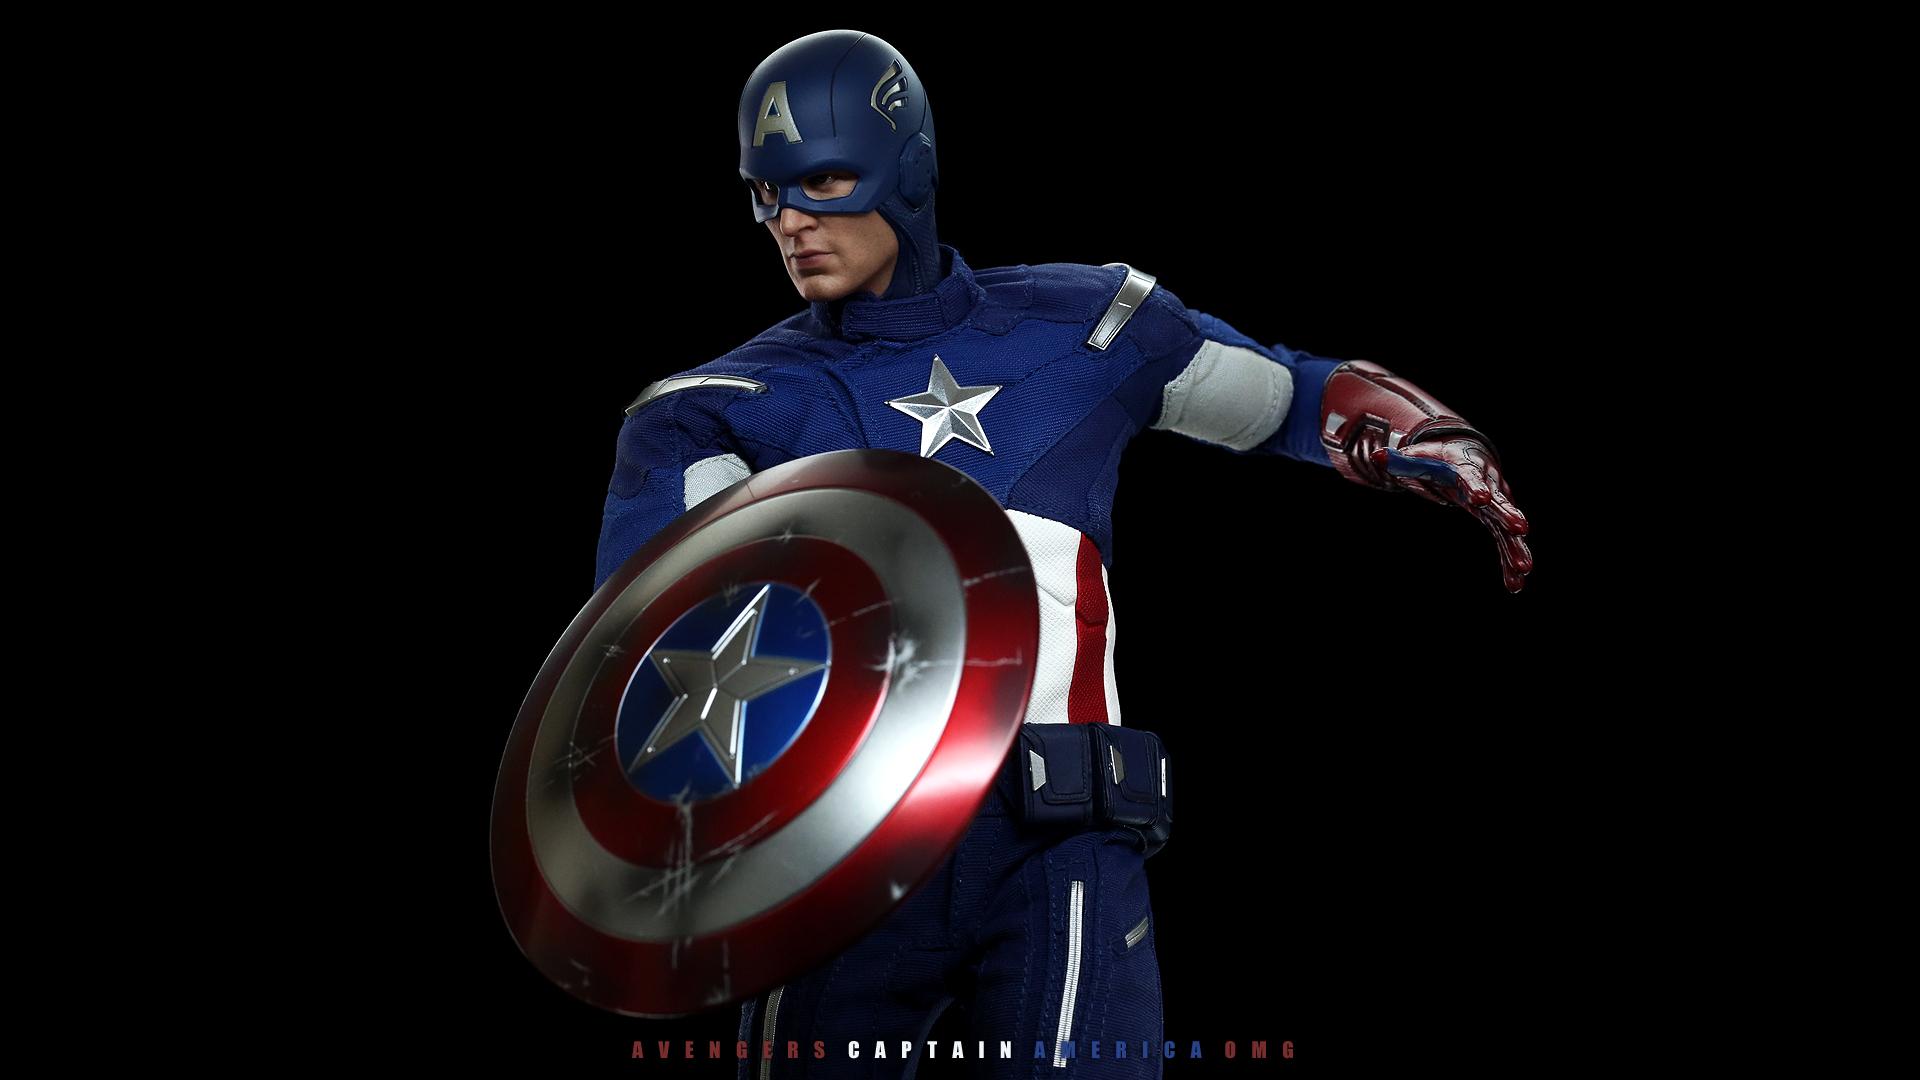 Download Captain America Avengers 2 HD Desktop Wallpapers We provide 1920x1080